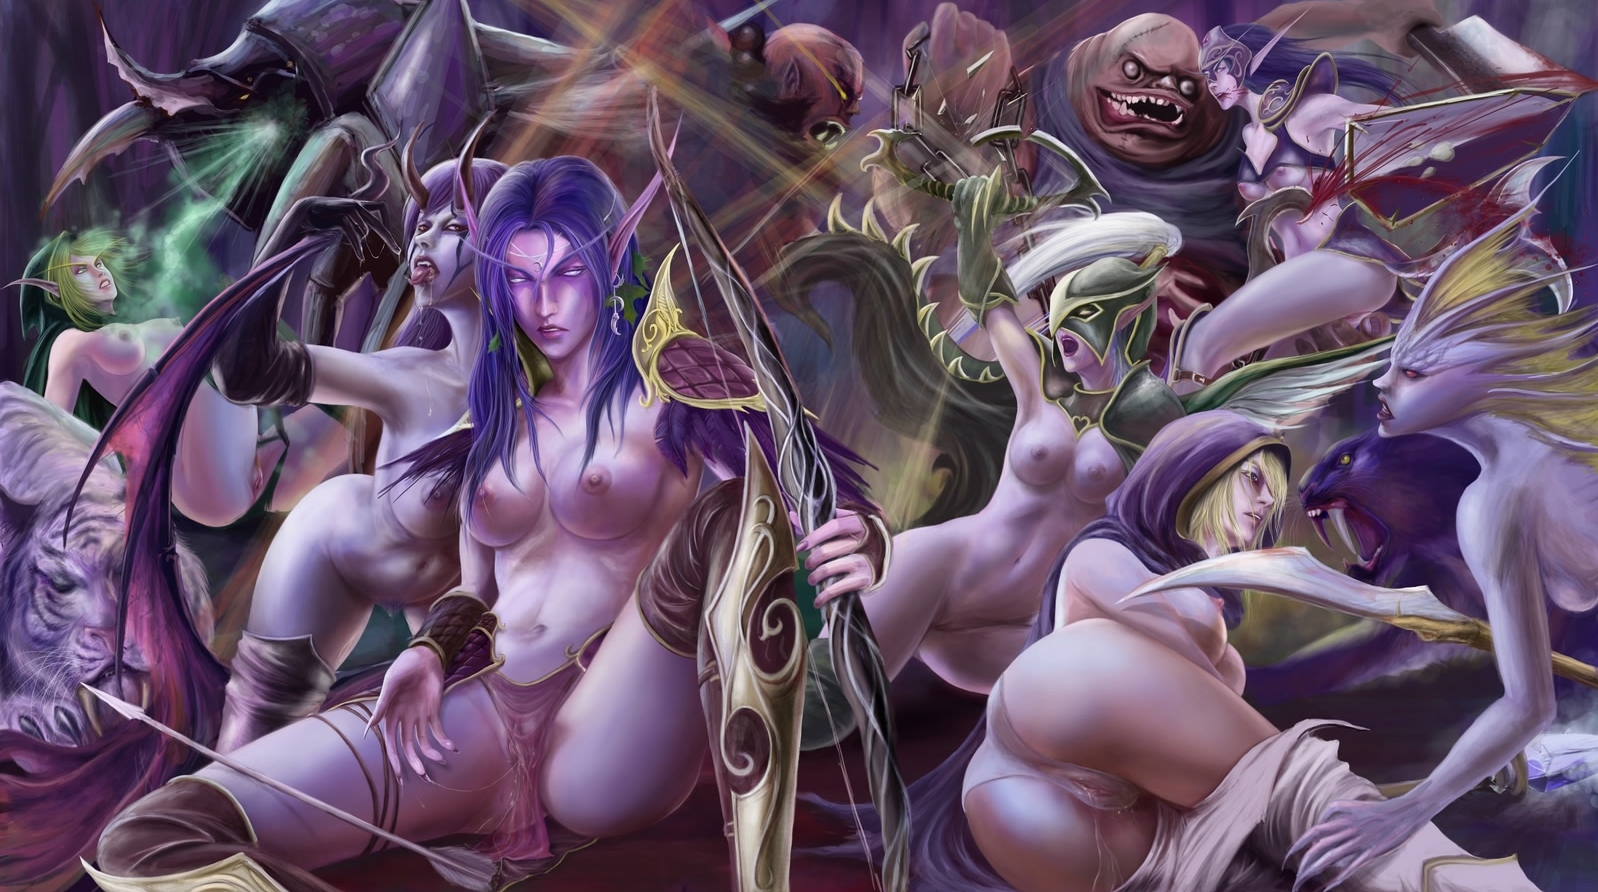 Naga tit pics erotic movies